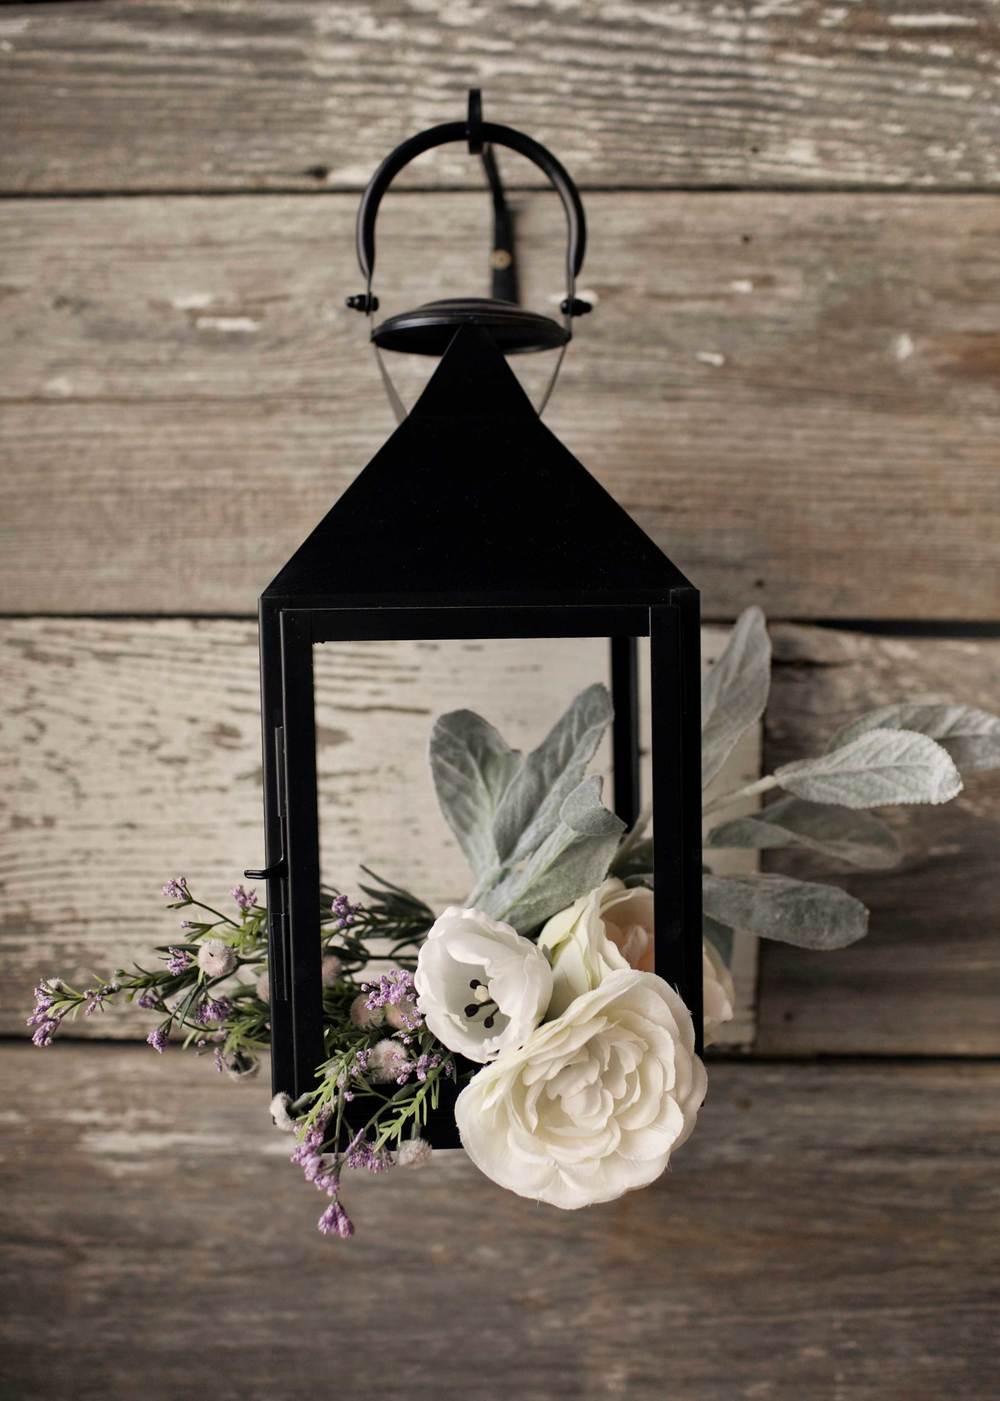 Spring lantern flowers